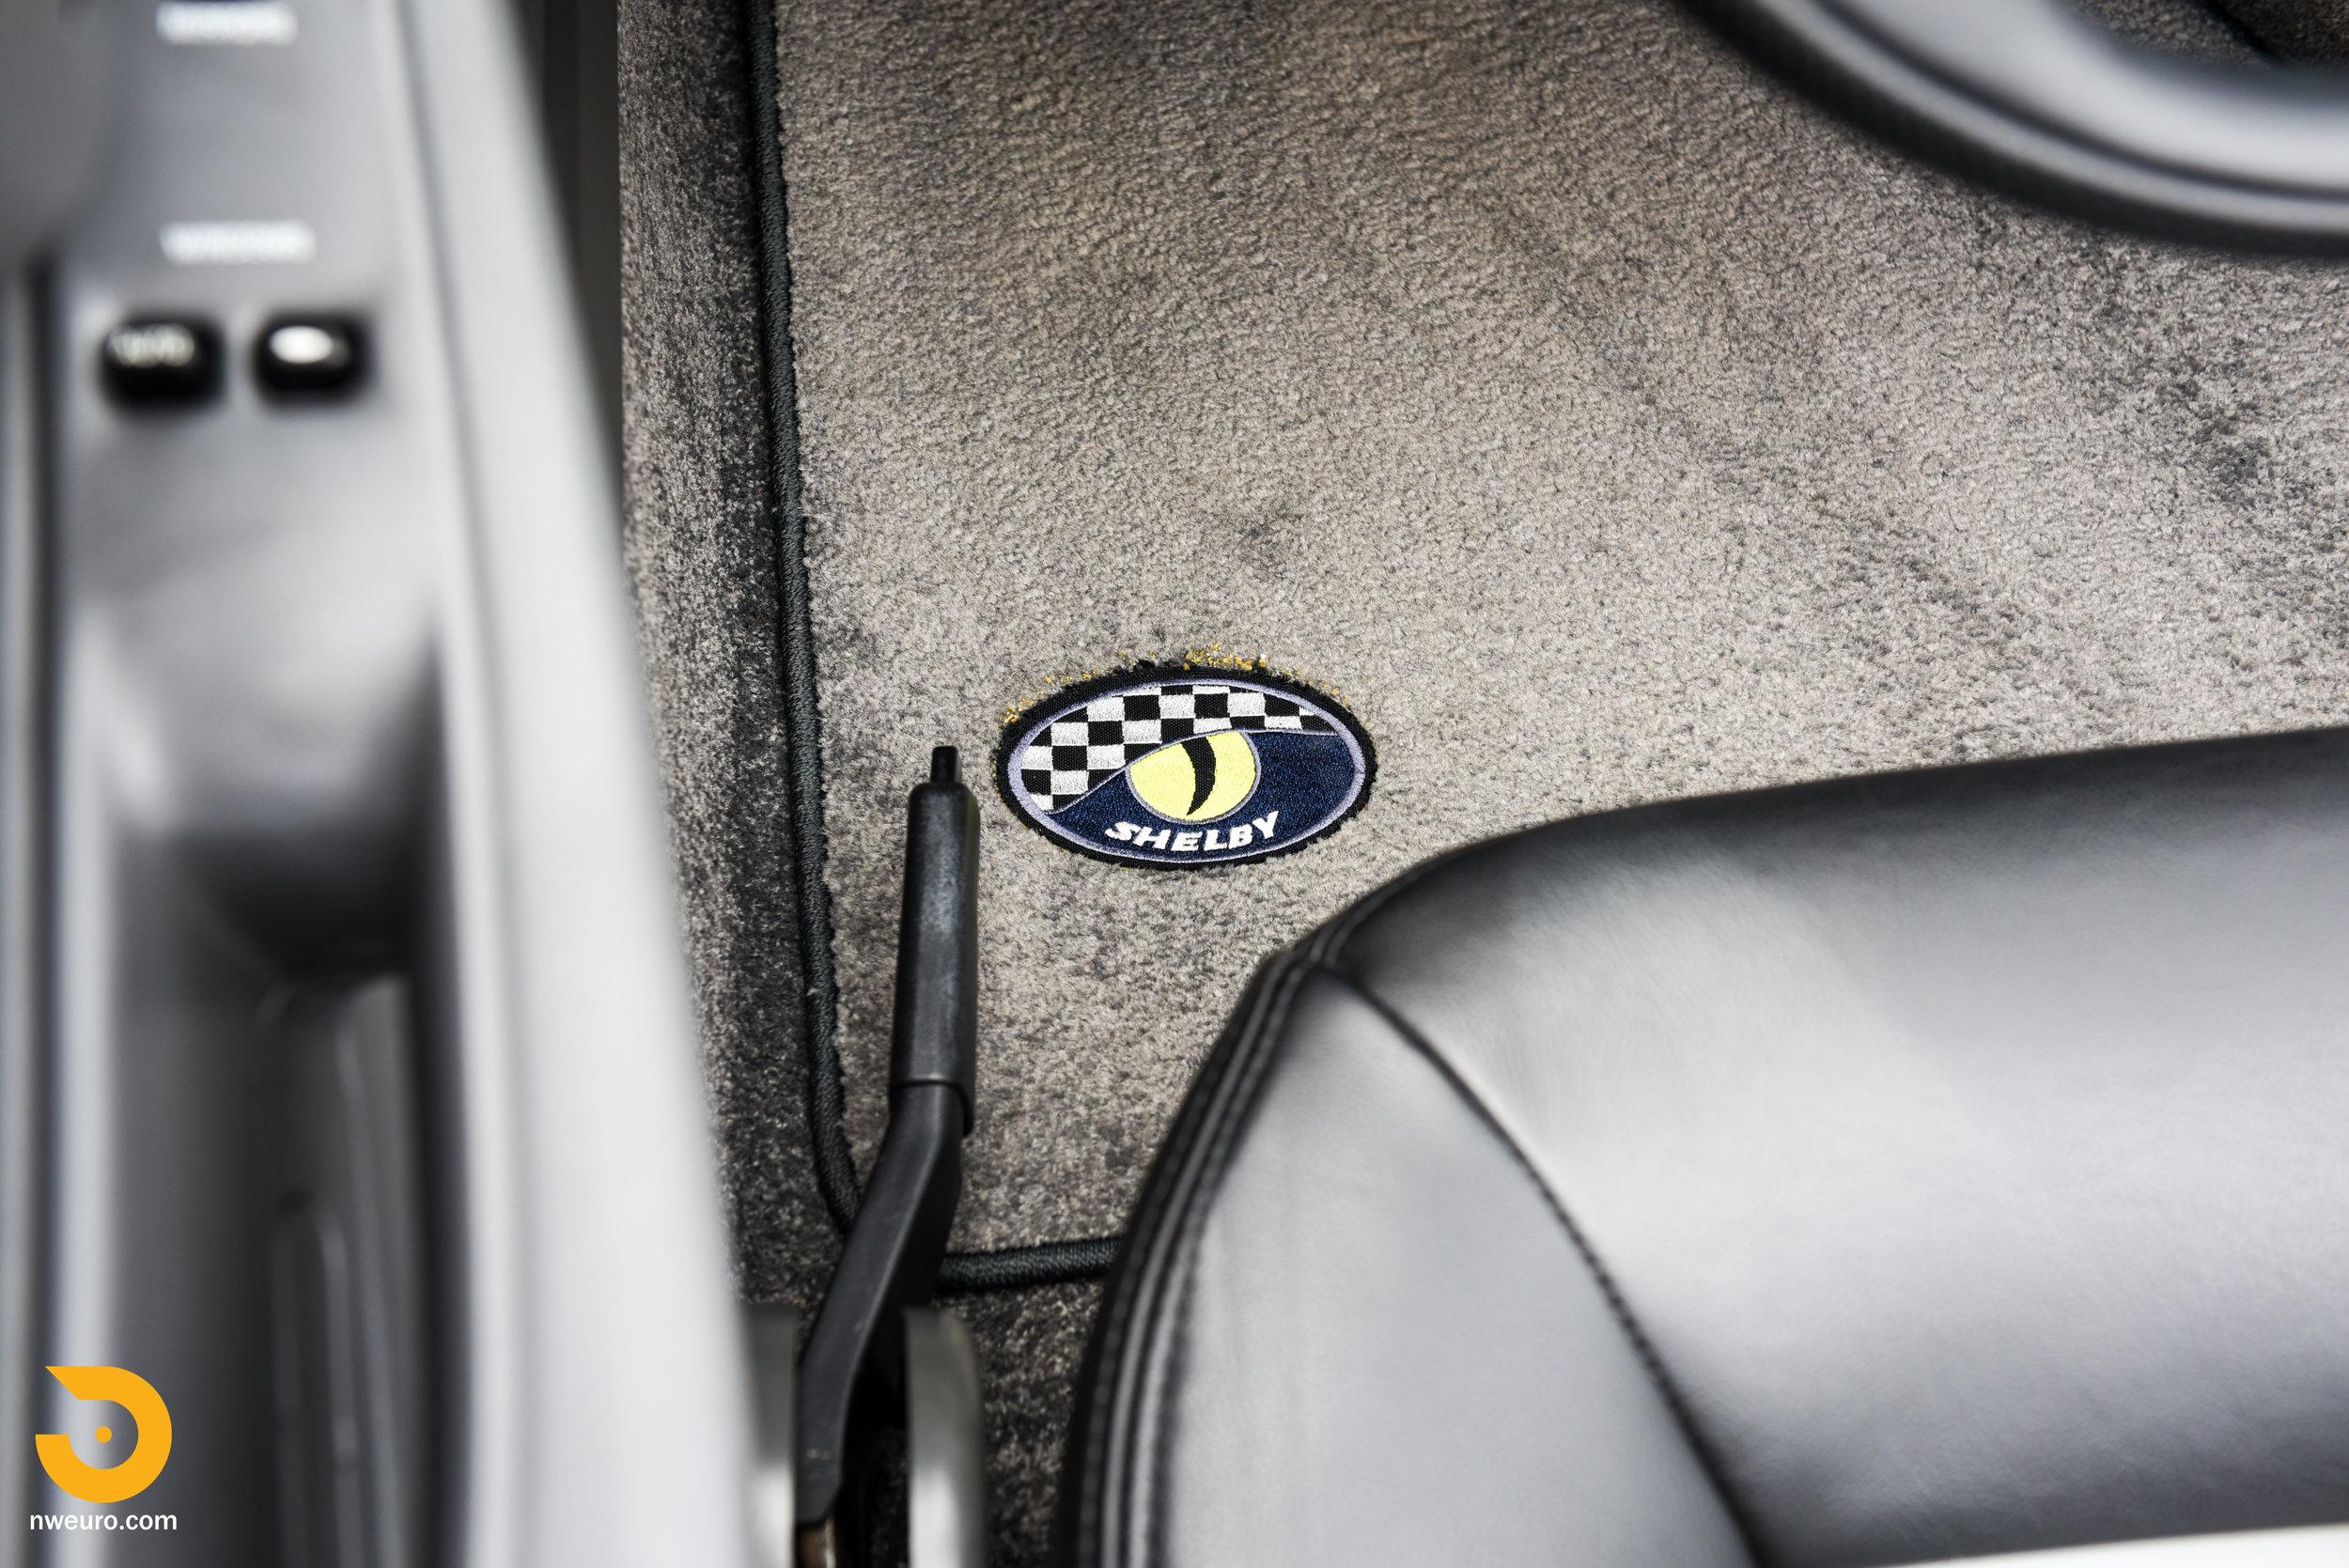 1999 Shelby Series 1-29.jpg